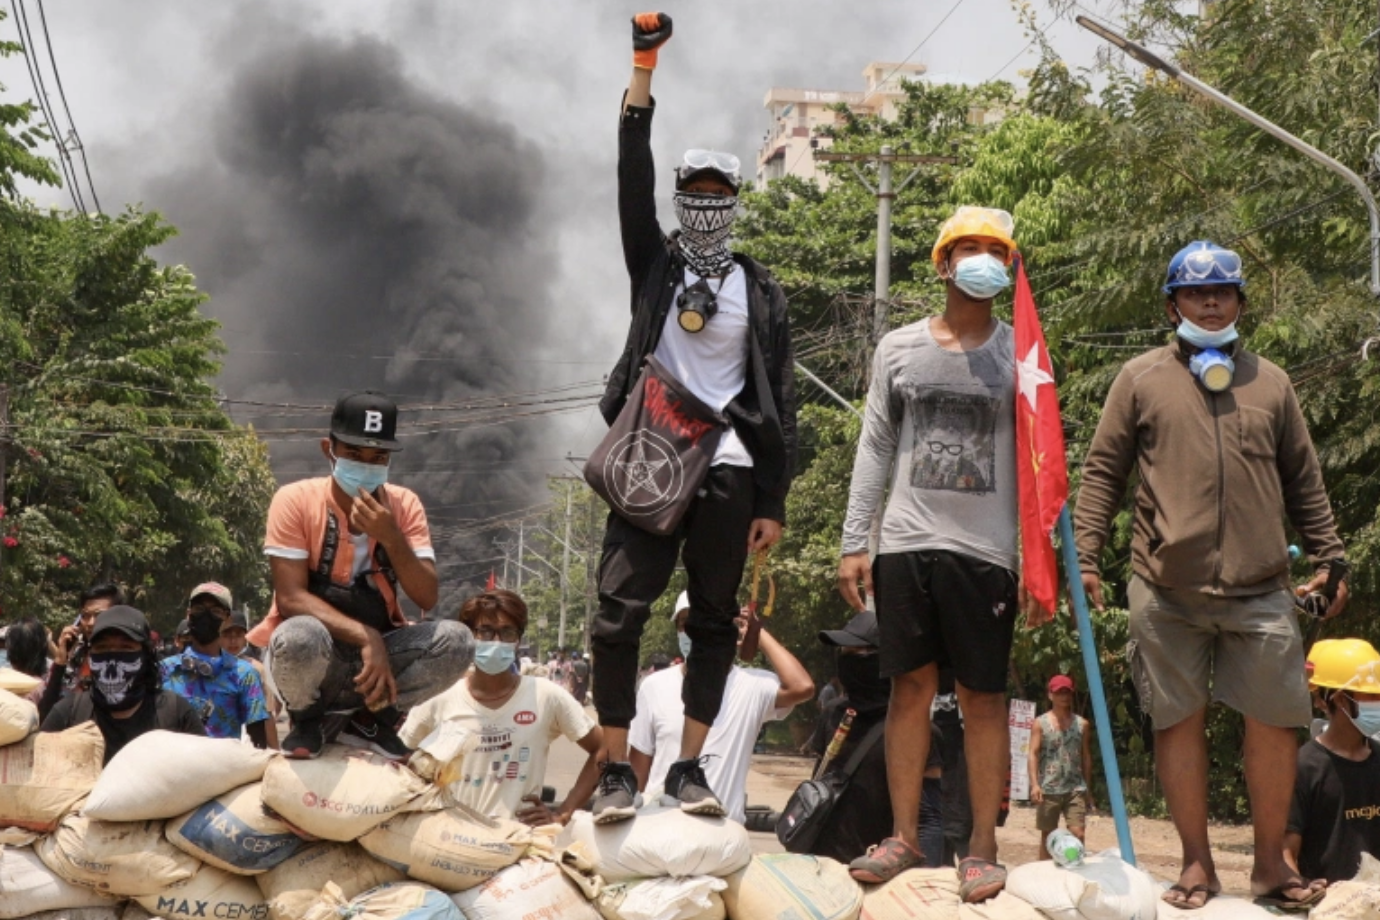 Myanmar protestors